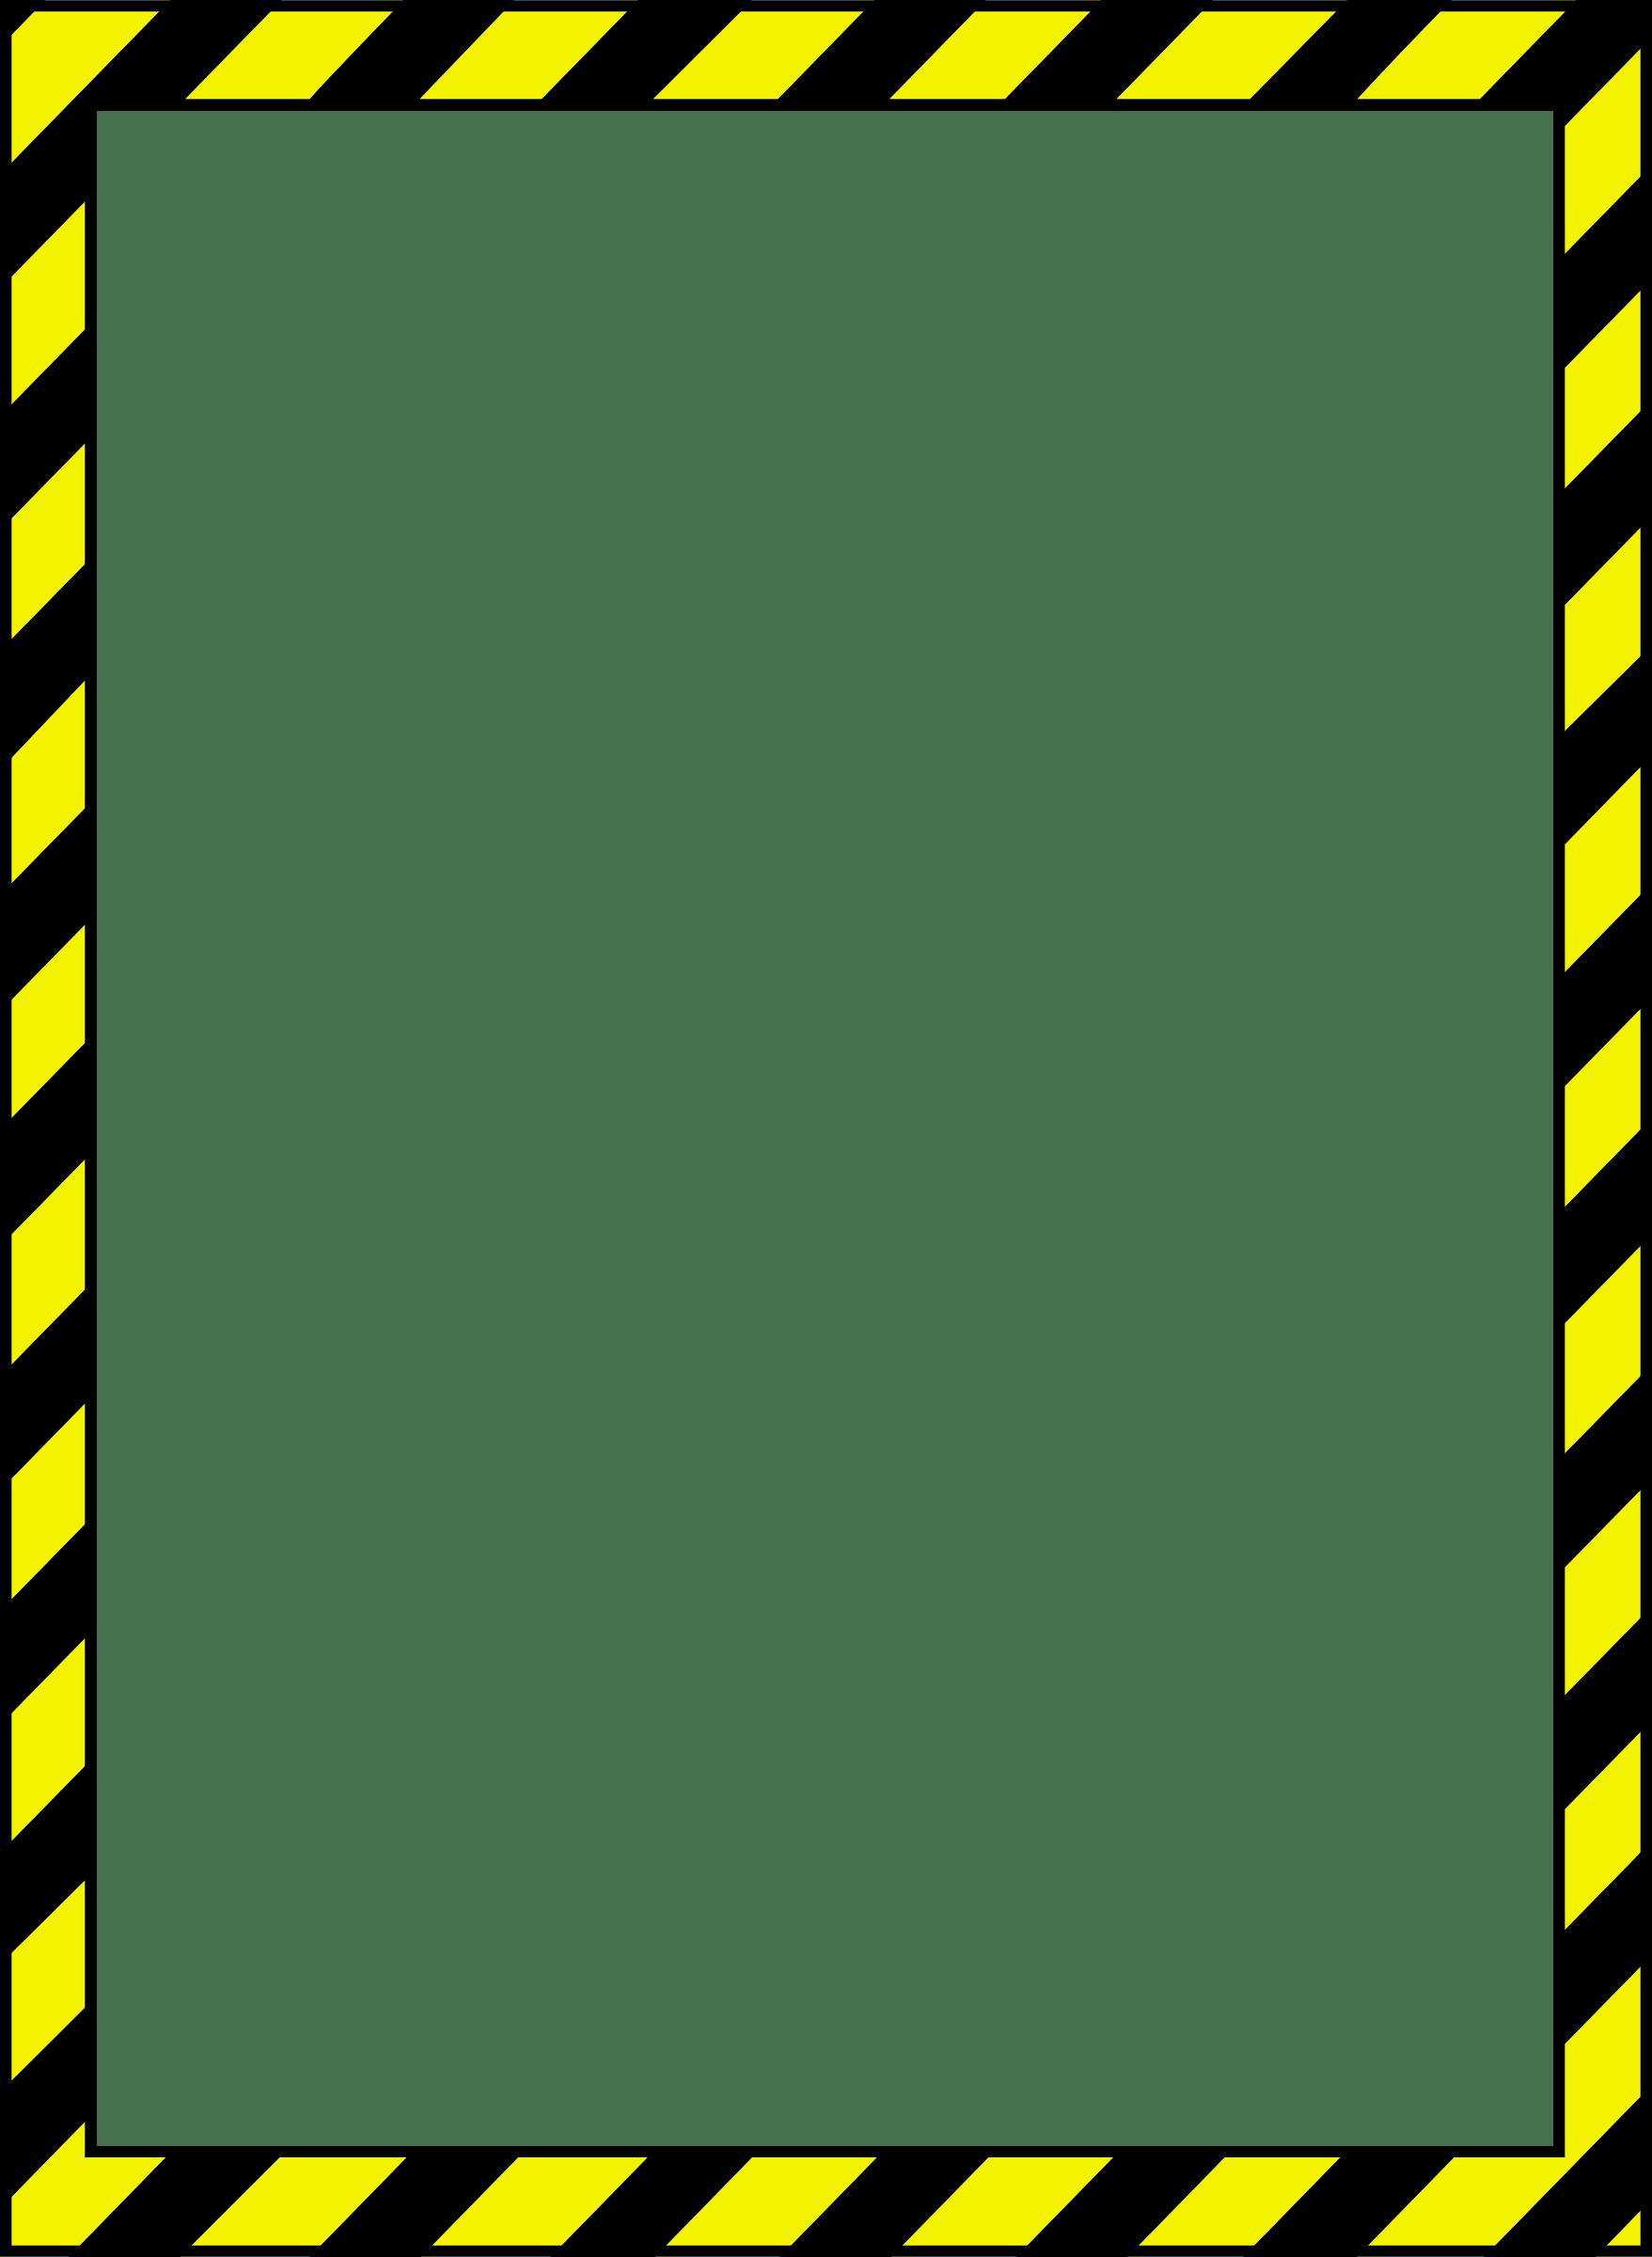 Police Car Lights Wallpaper Clipart Caution Border 2